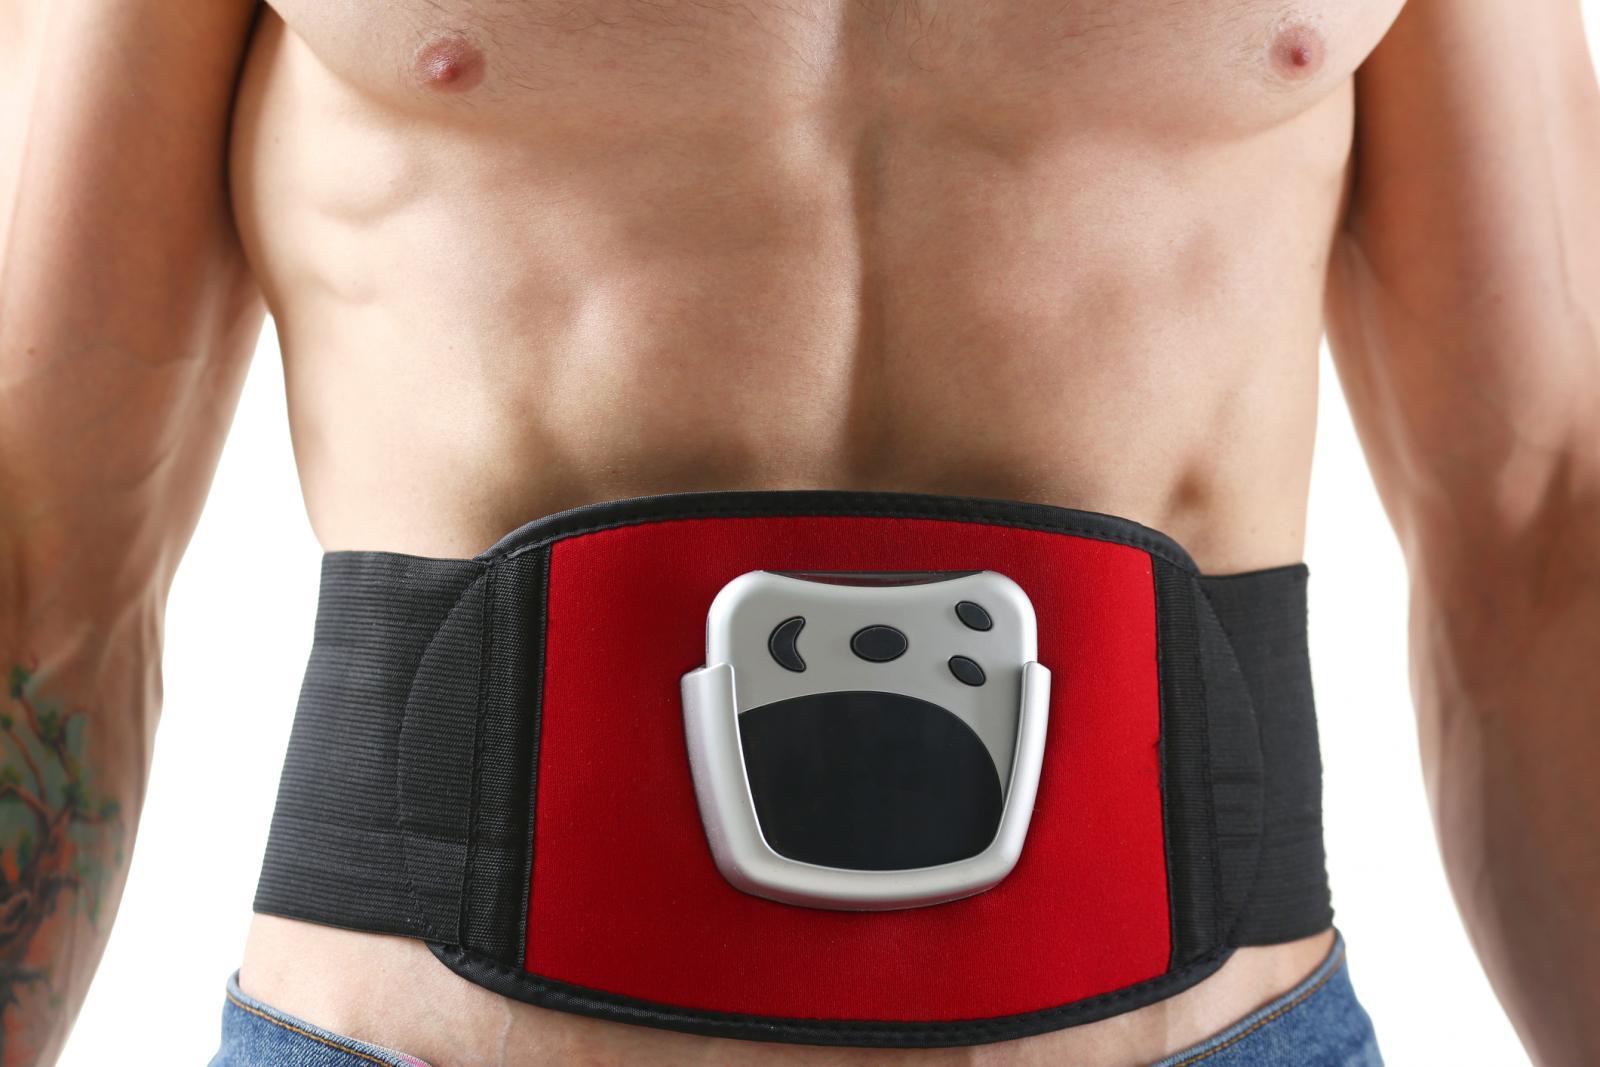 Man wearing a ab belt